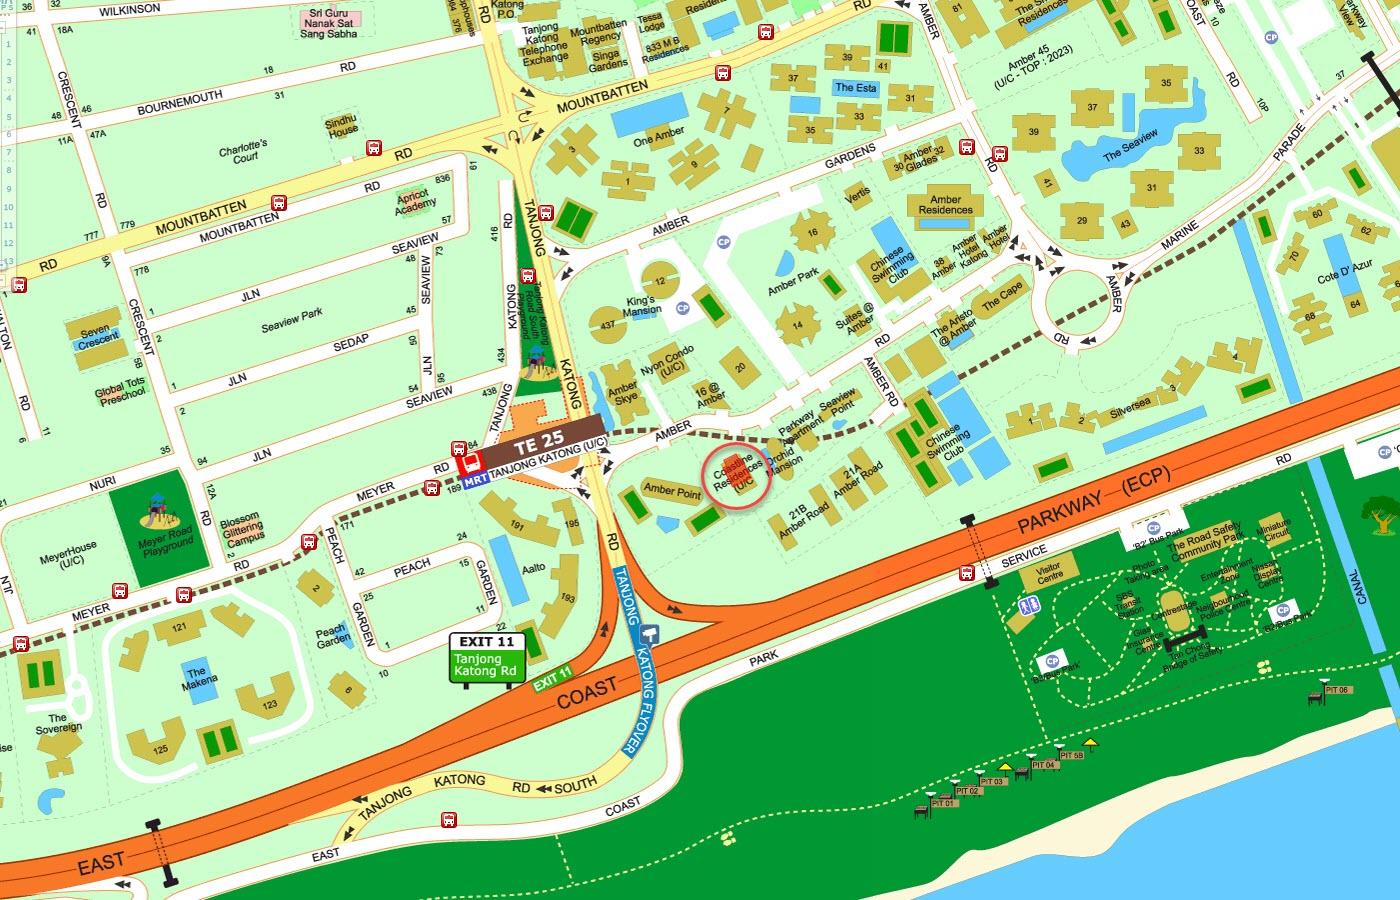 Coastline Residences Condo Street Directory Map